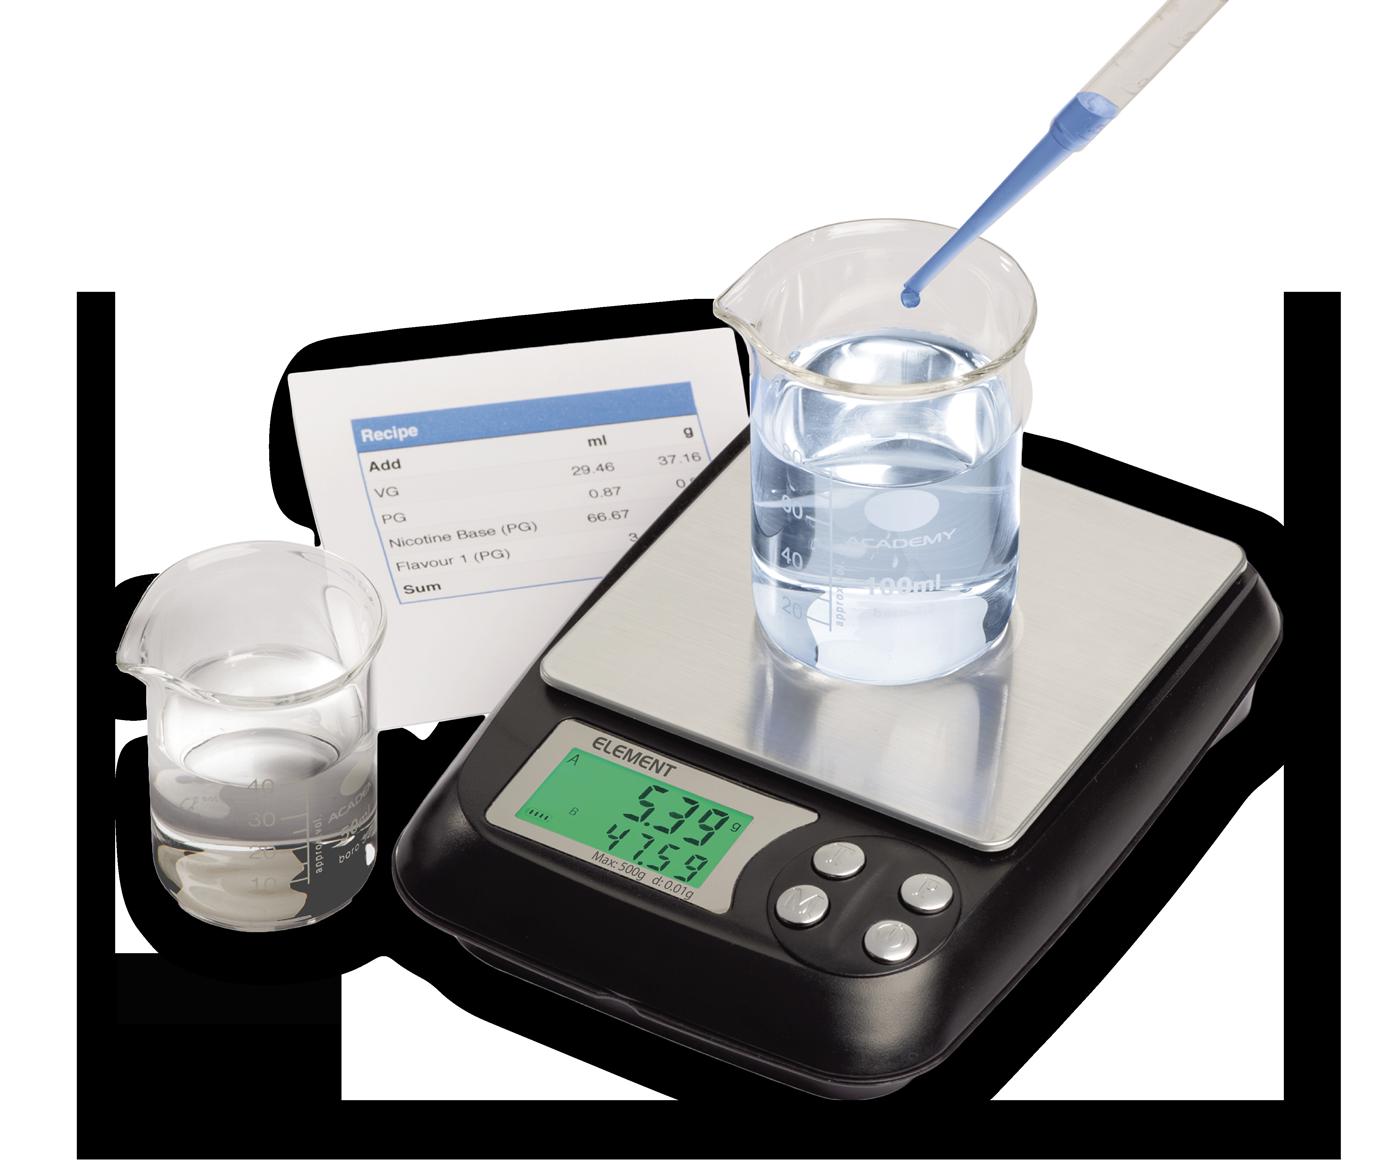 E-Liquid Scales